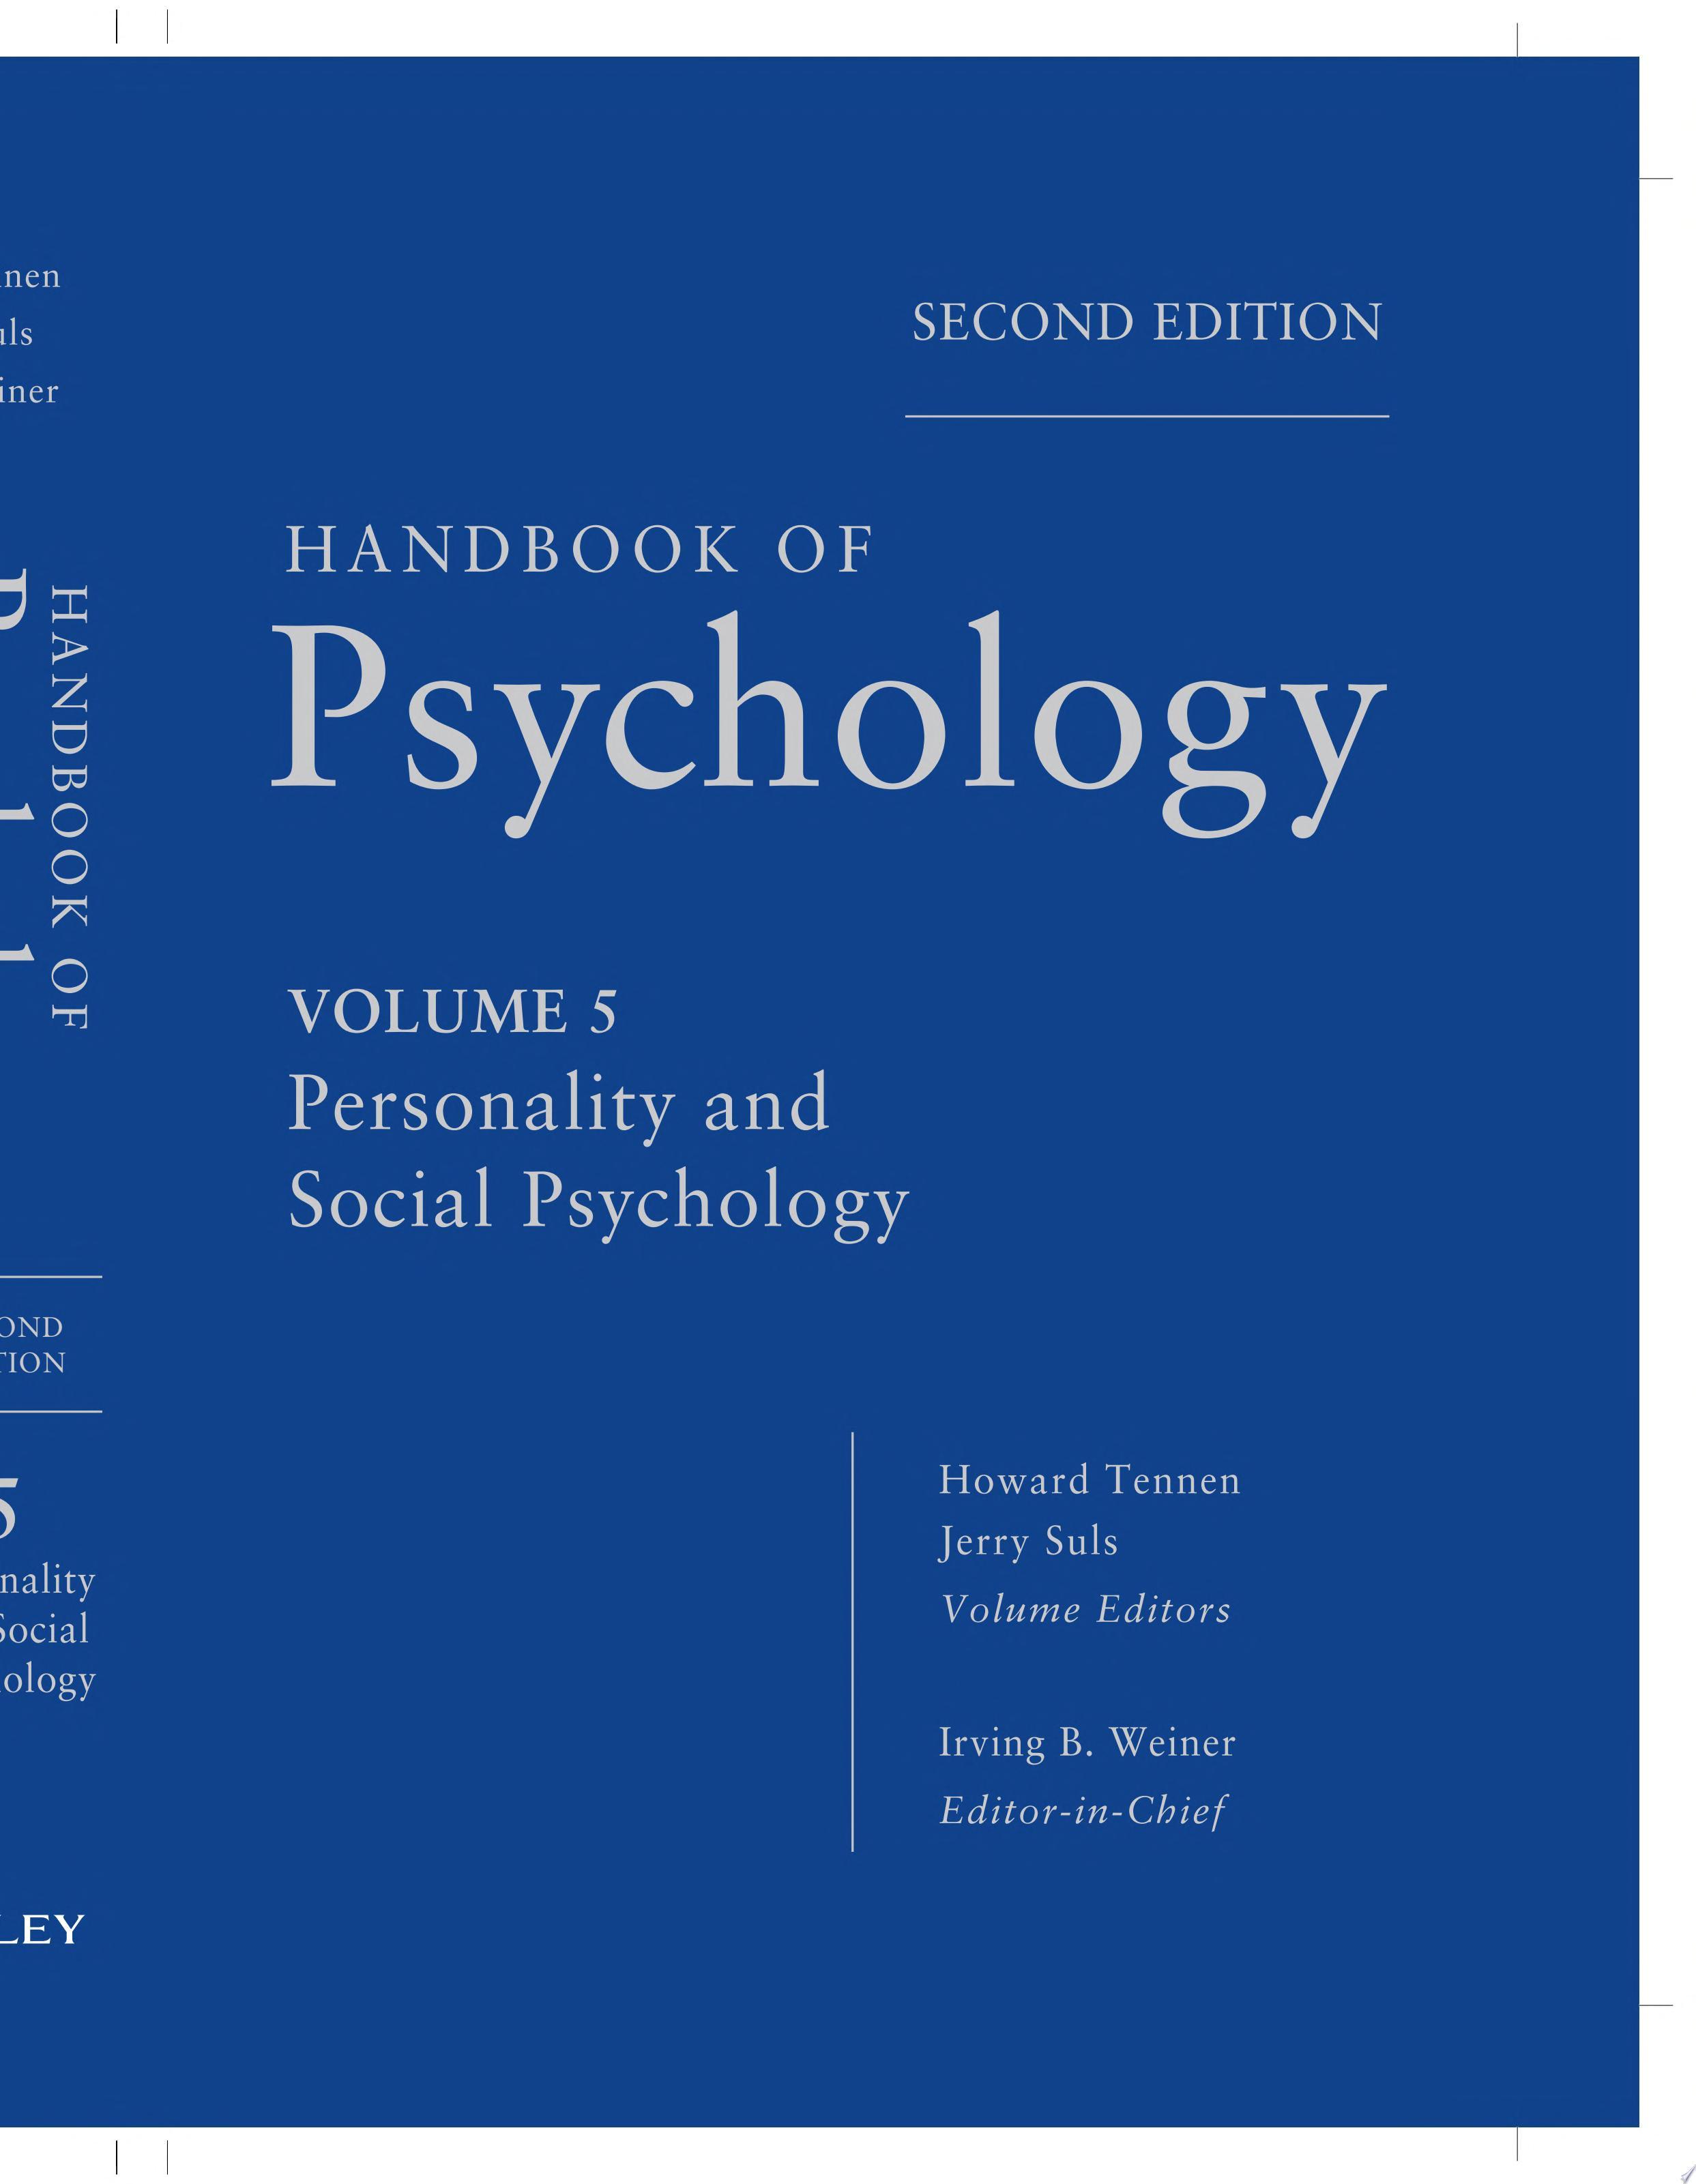 Handbook of Psychology  Personality and Social Psychology